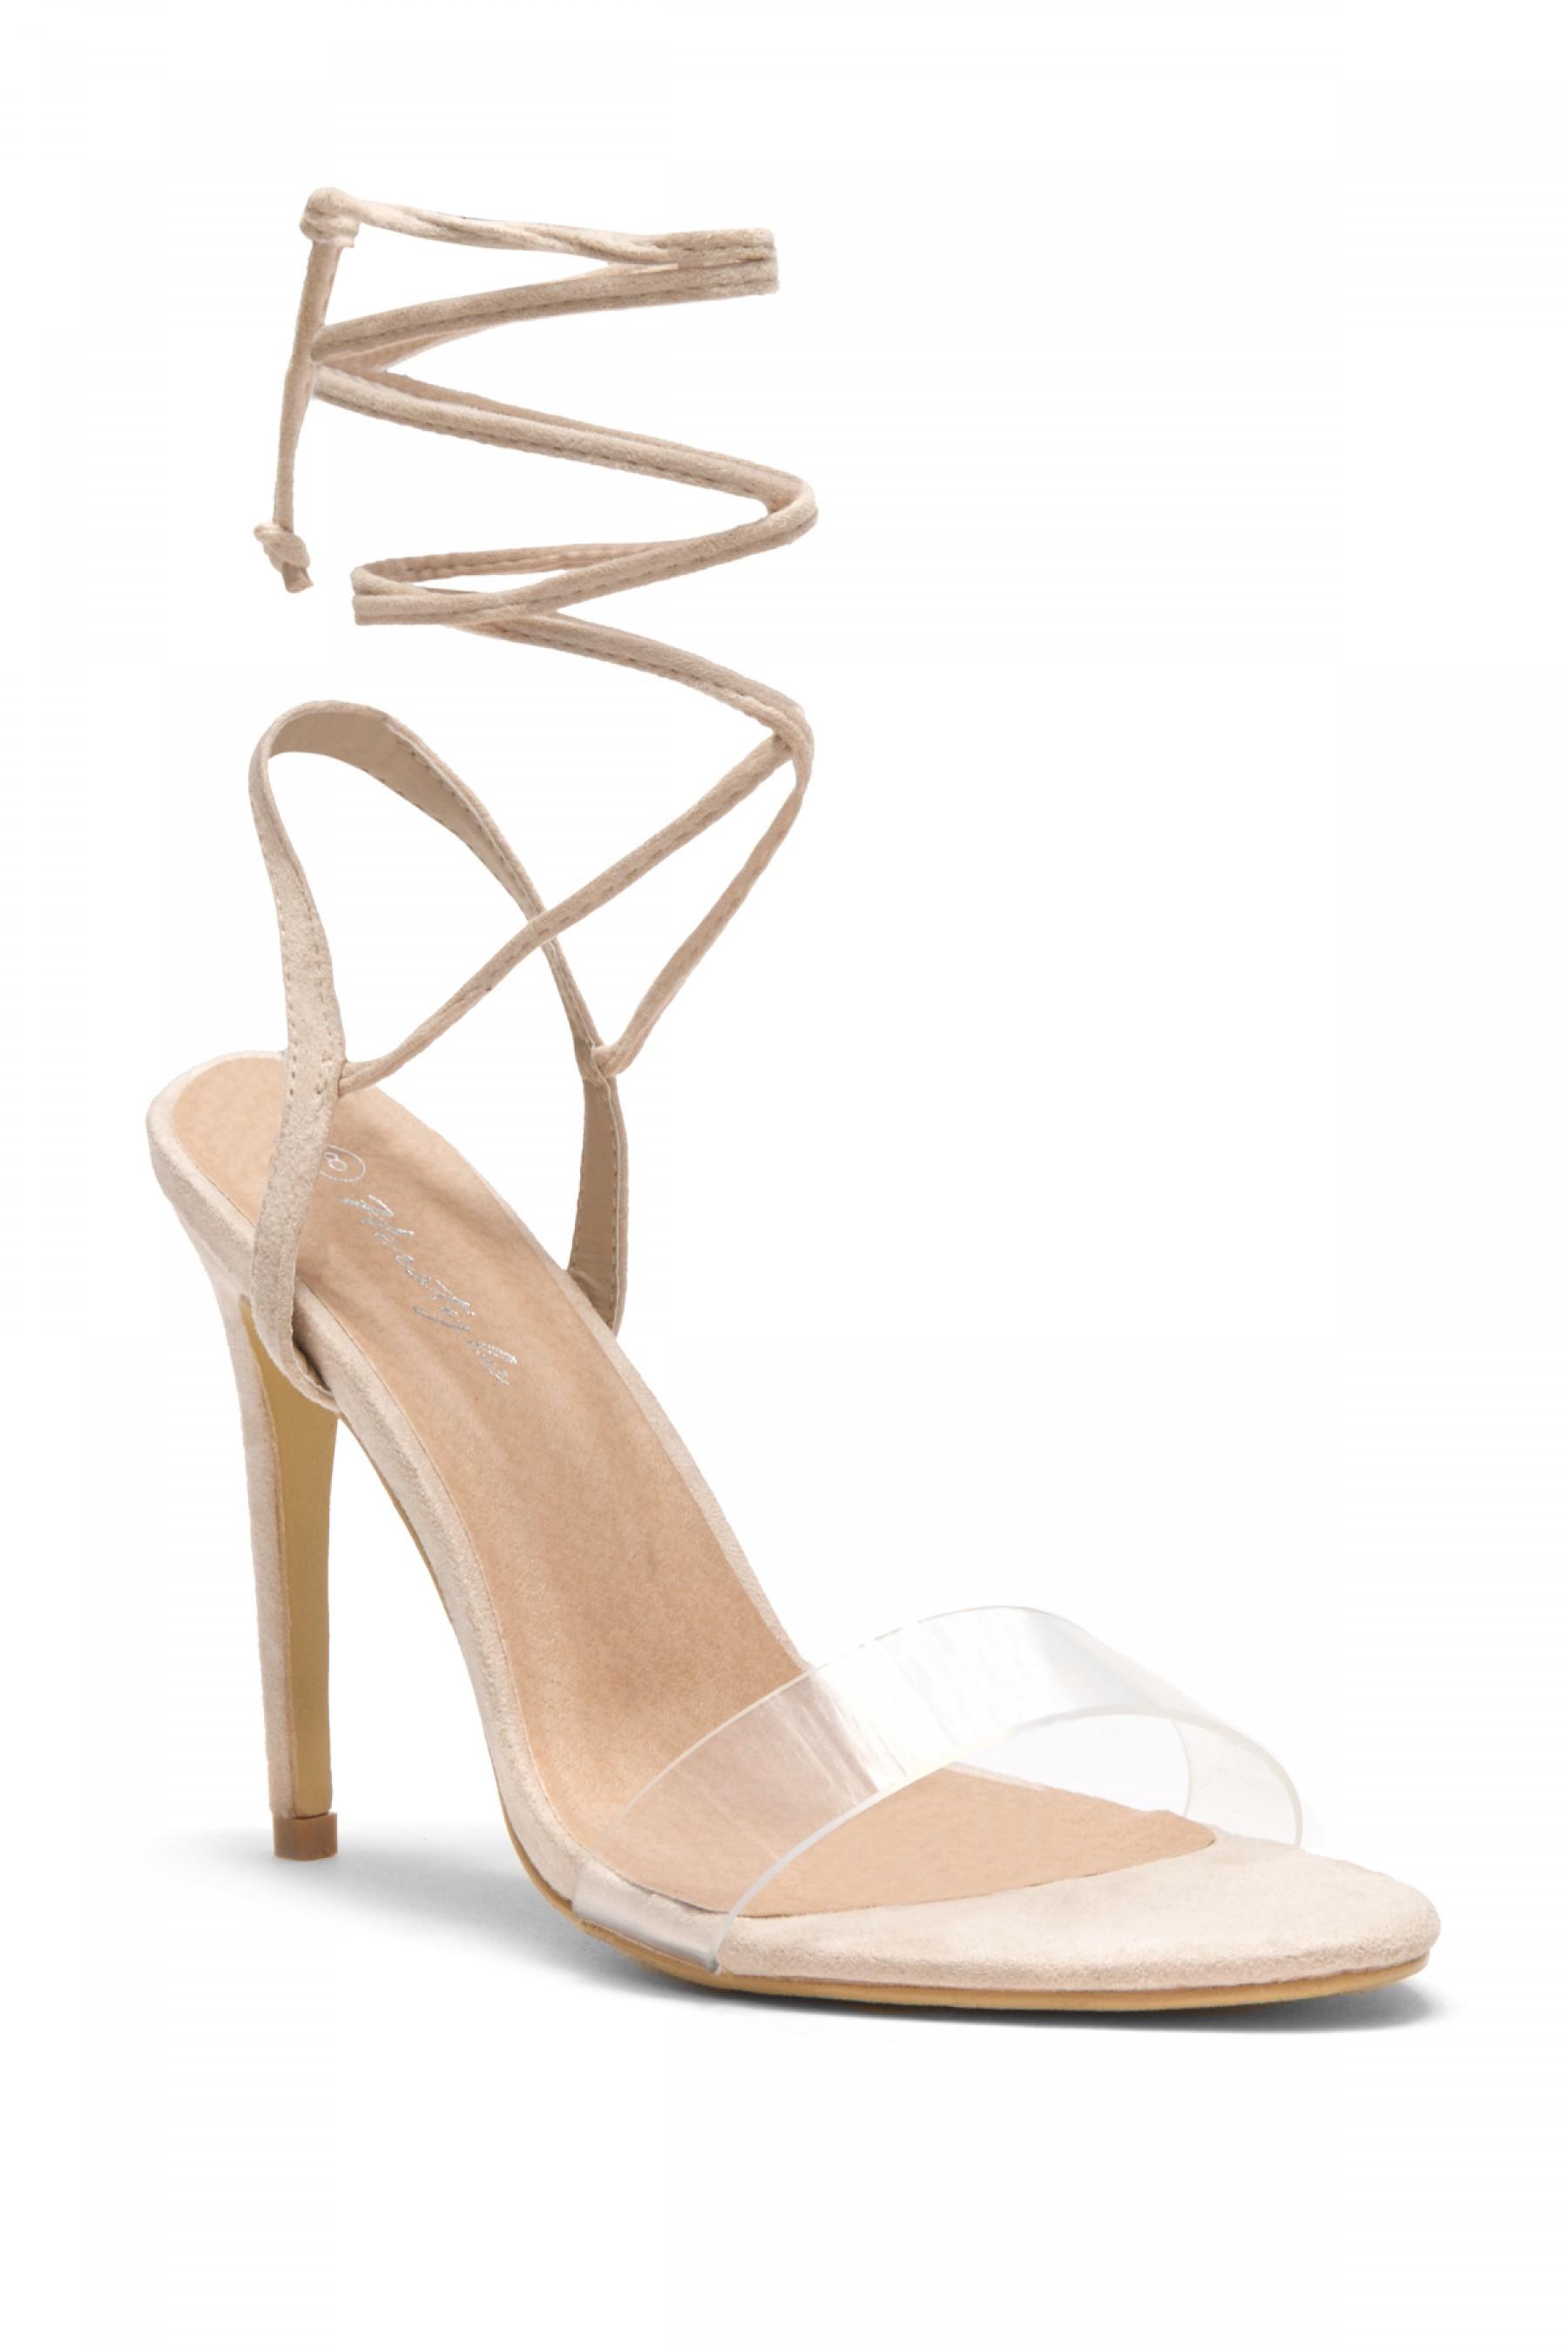 HerStyle Women's Manmade Senerra Suede Lucite Ankle-Tie Open Toe Stiletto Heel - Nude